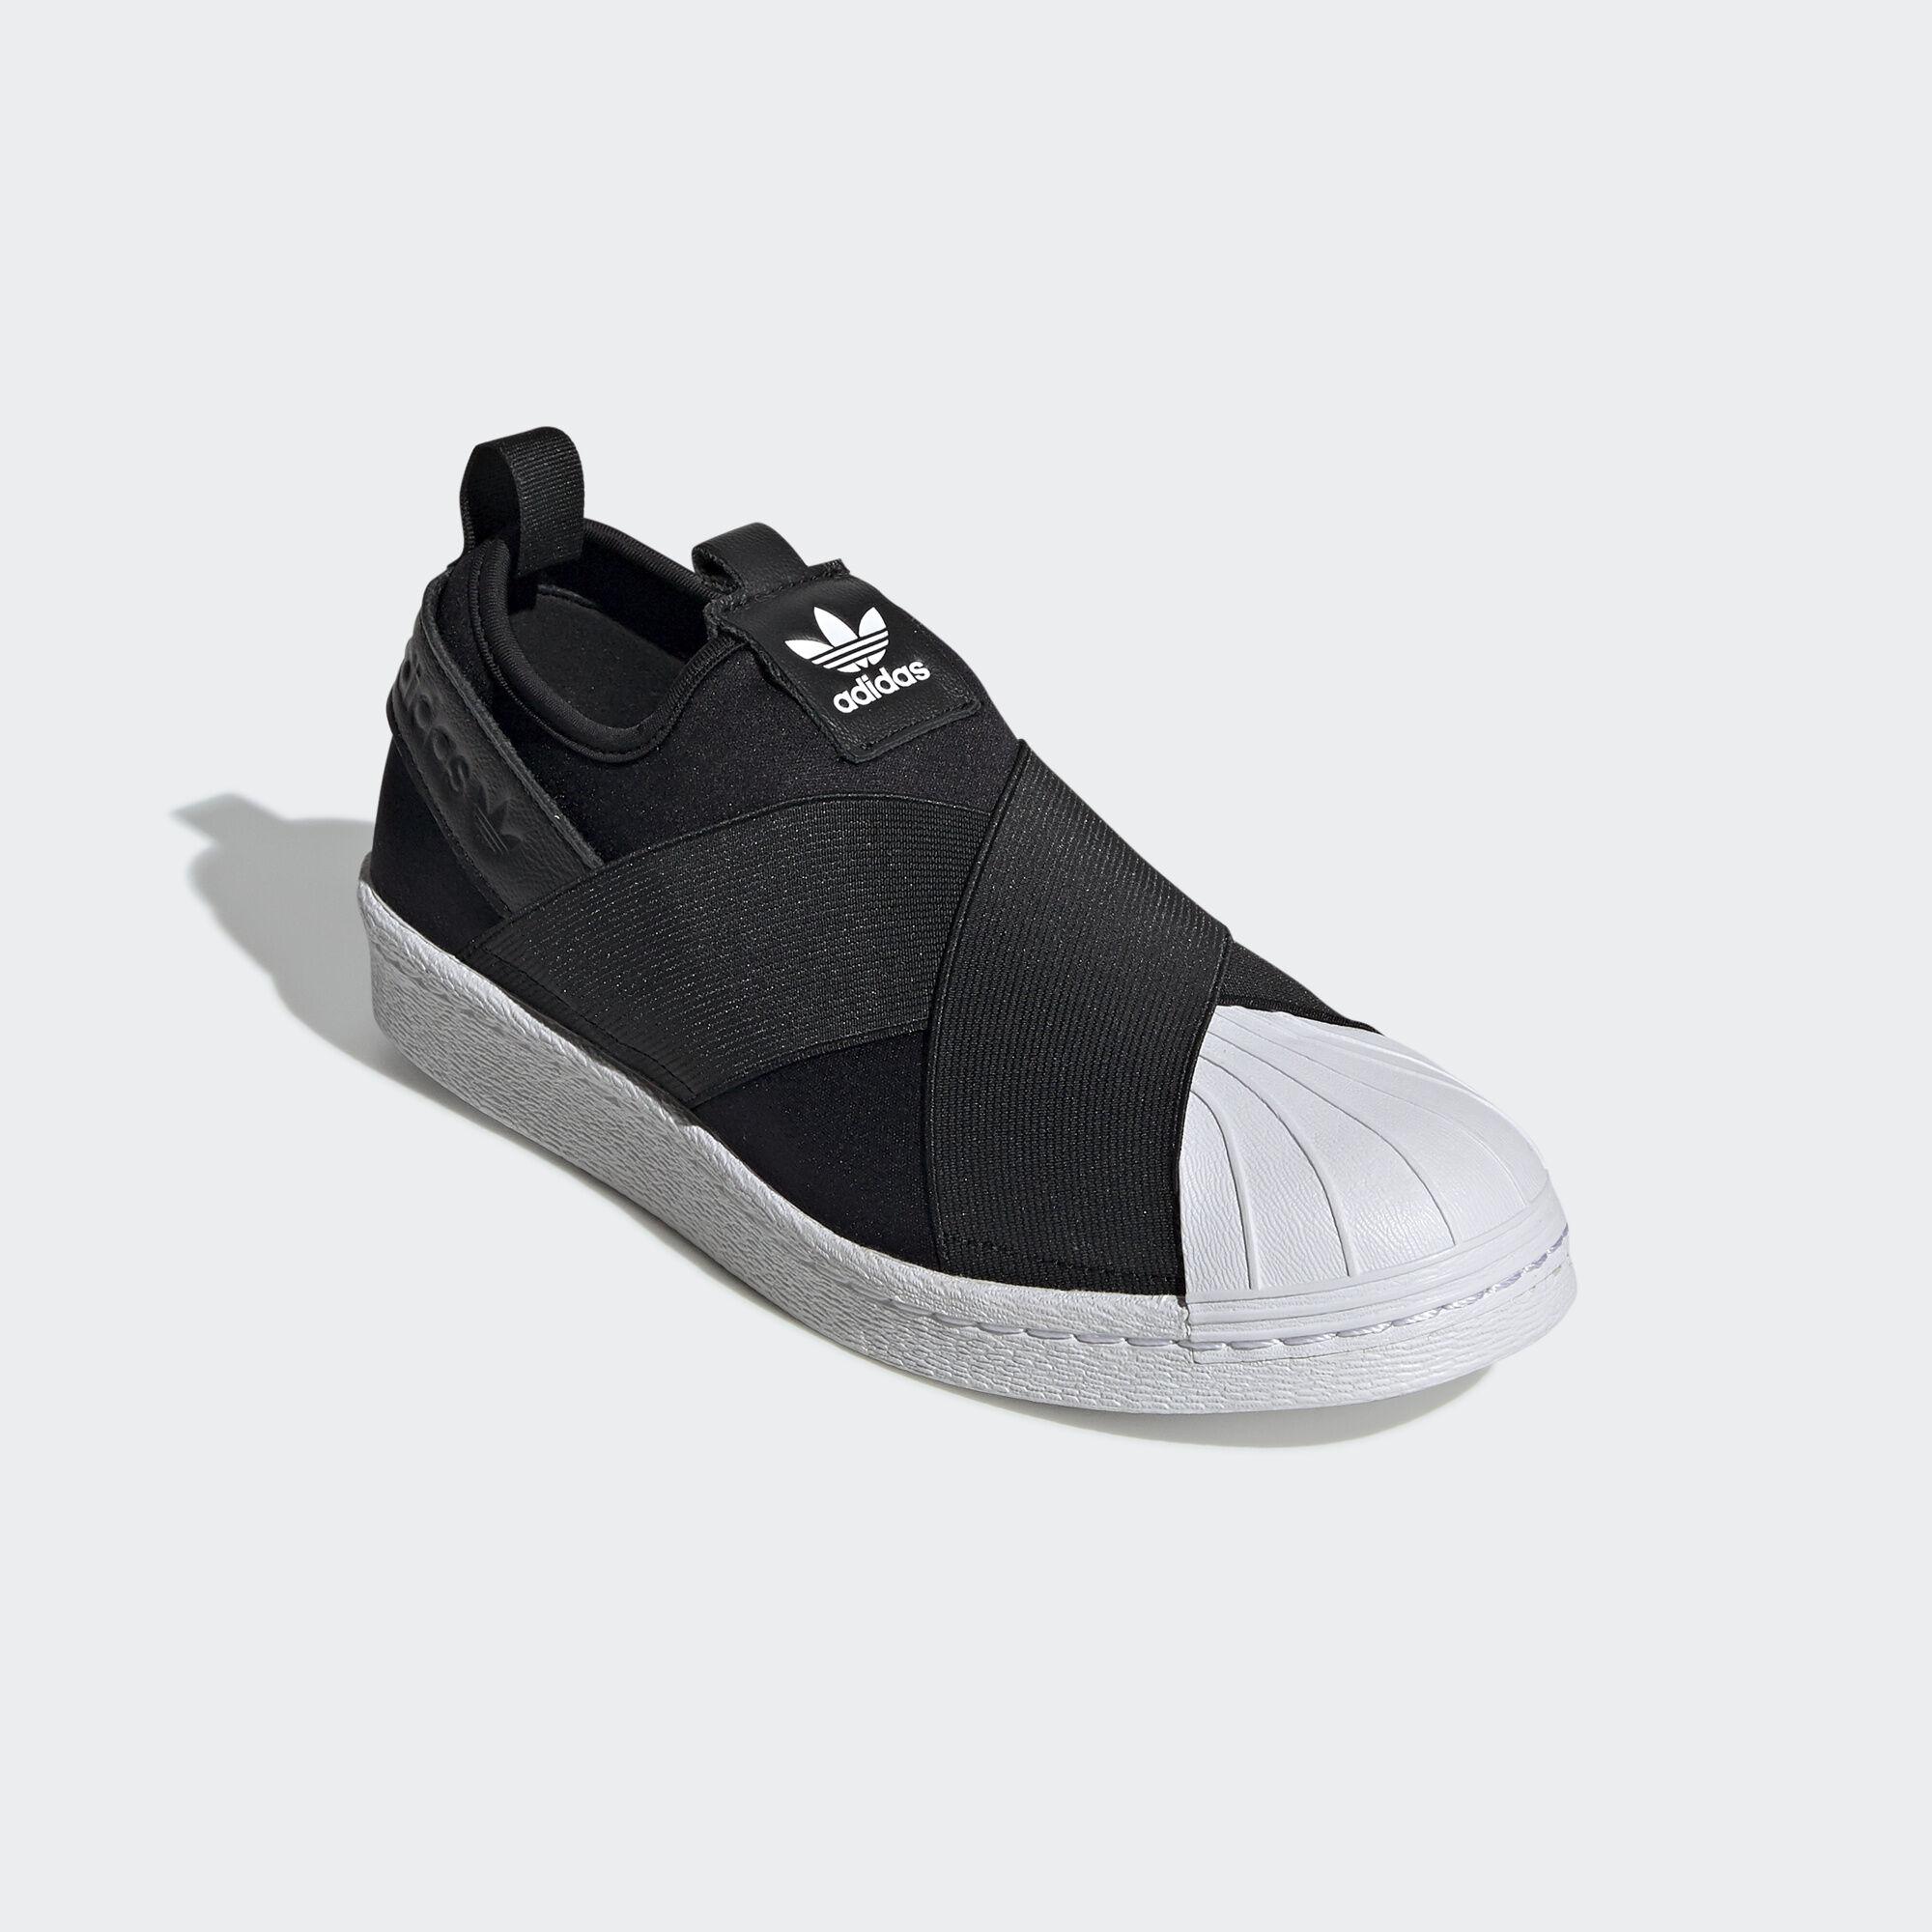 adidas superstar hk